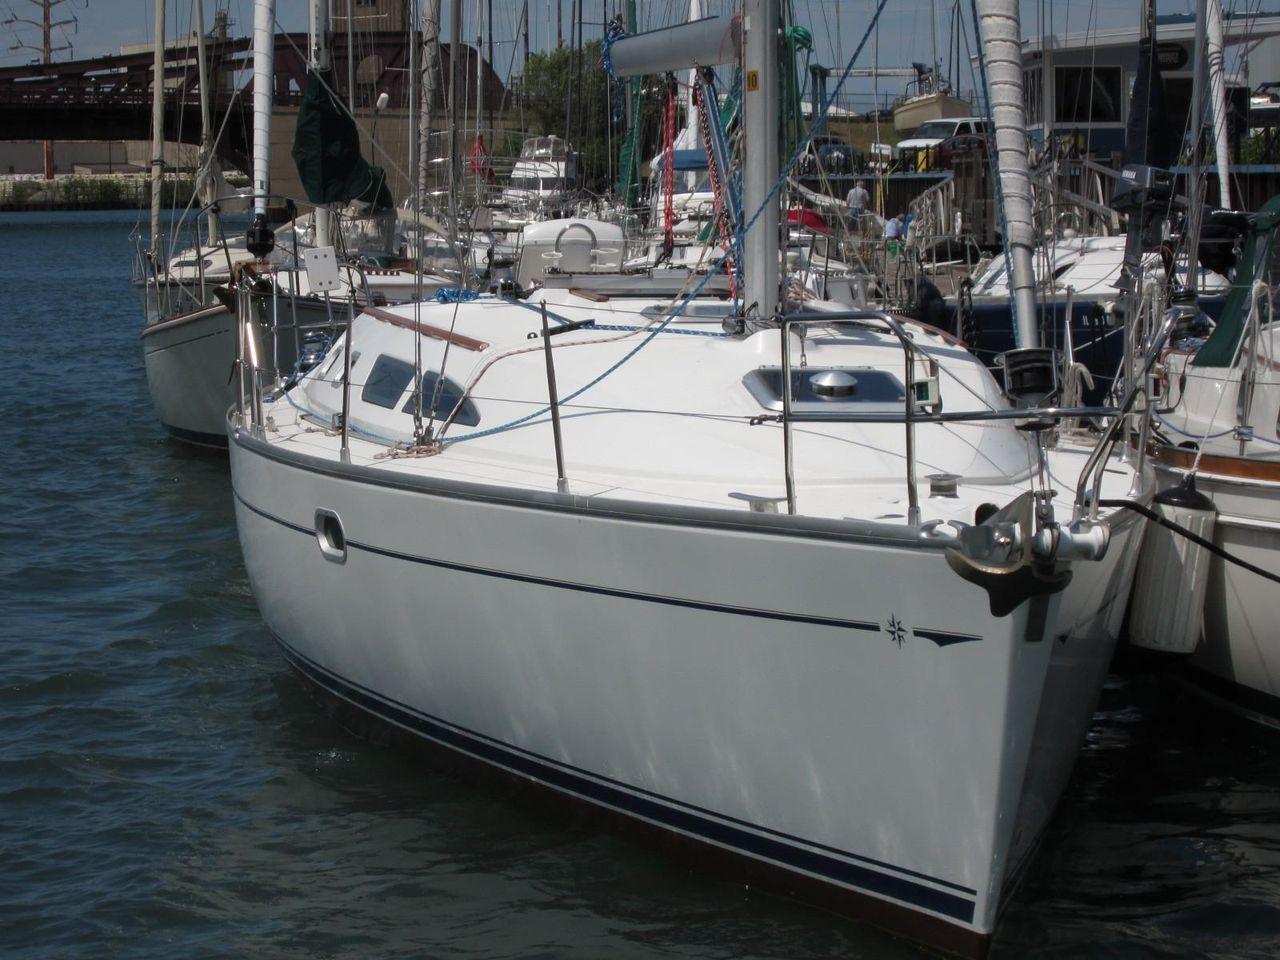 2005 Used Jeanneau Sun Odyssey 37 Cruiser Sailboat For Sale